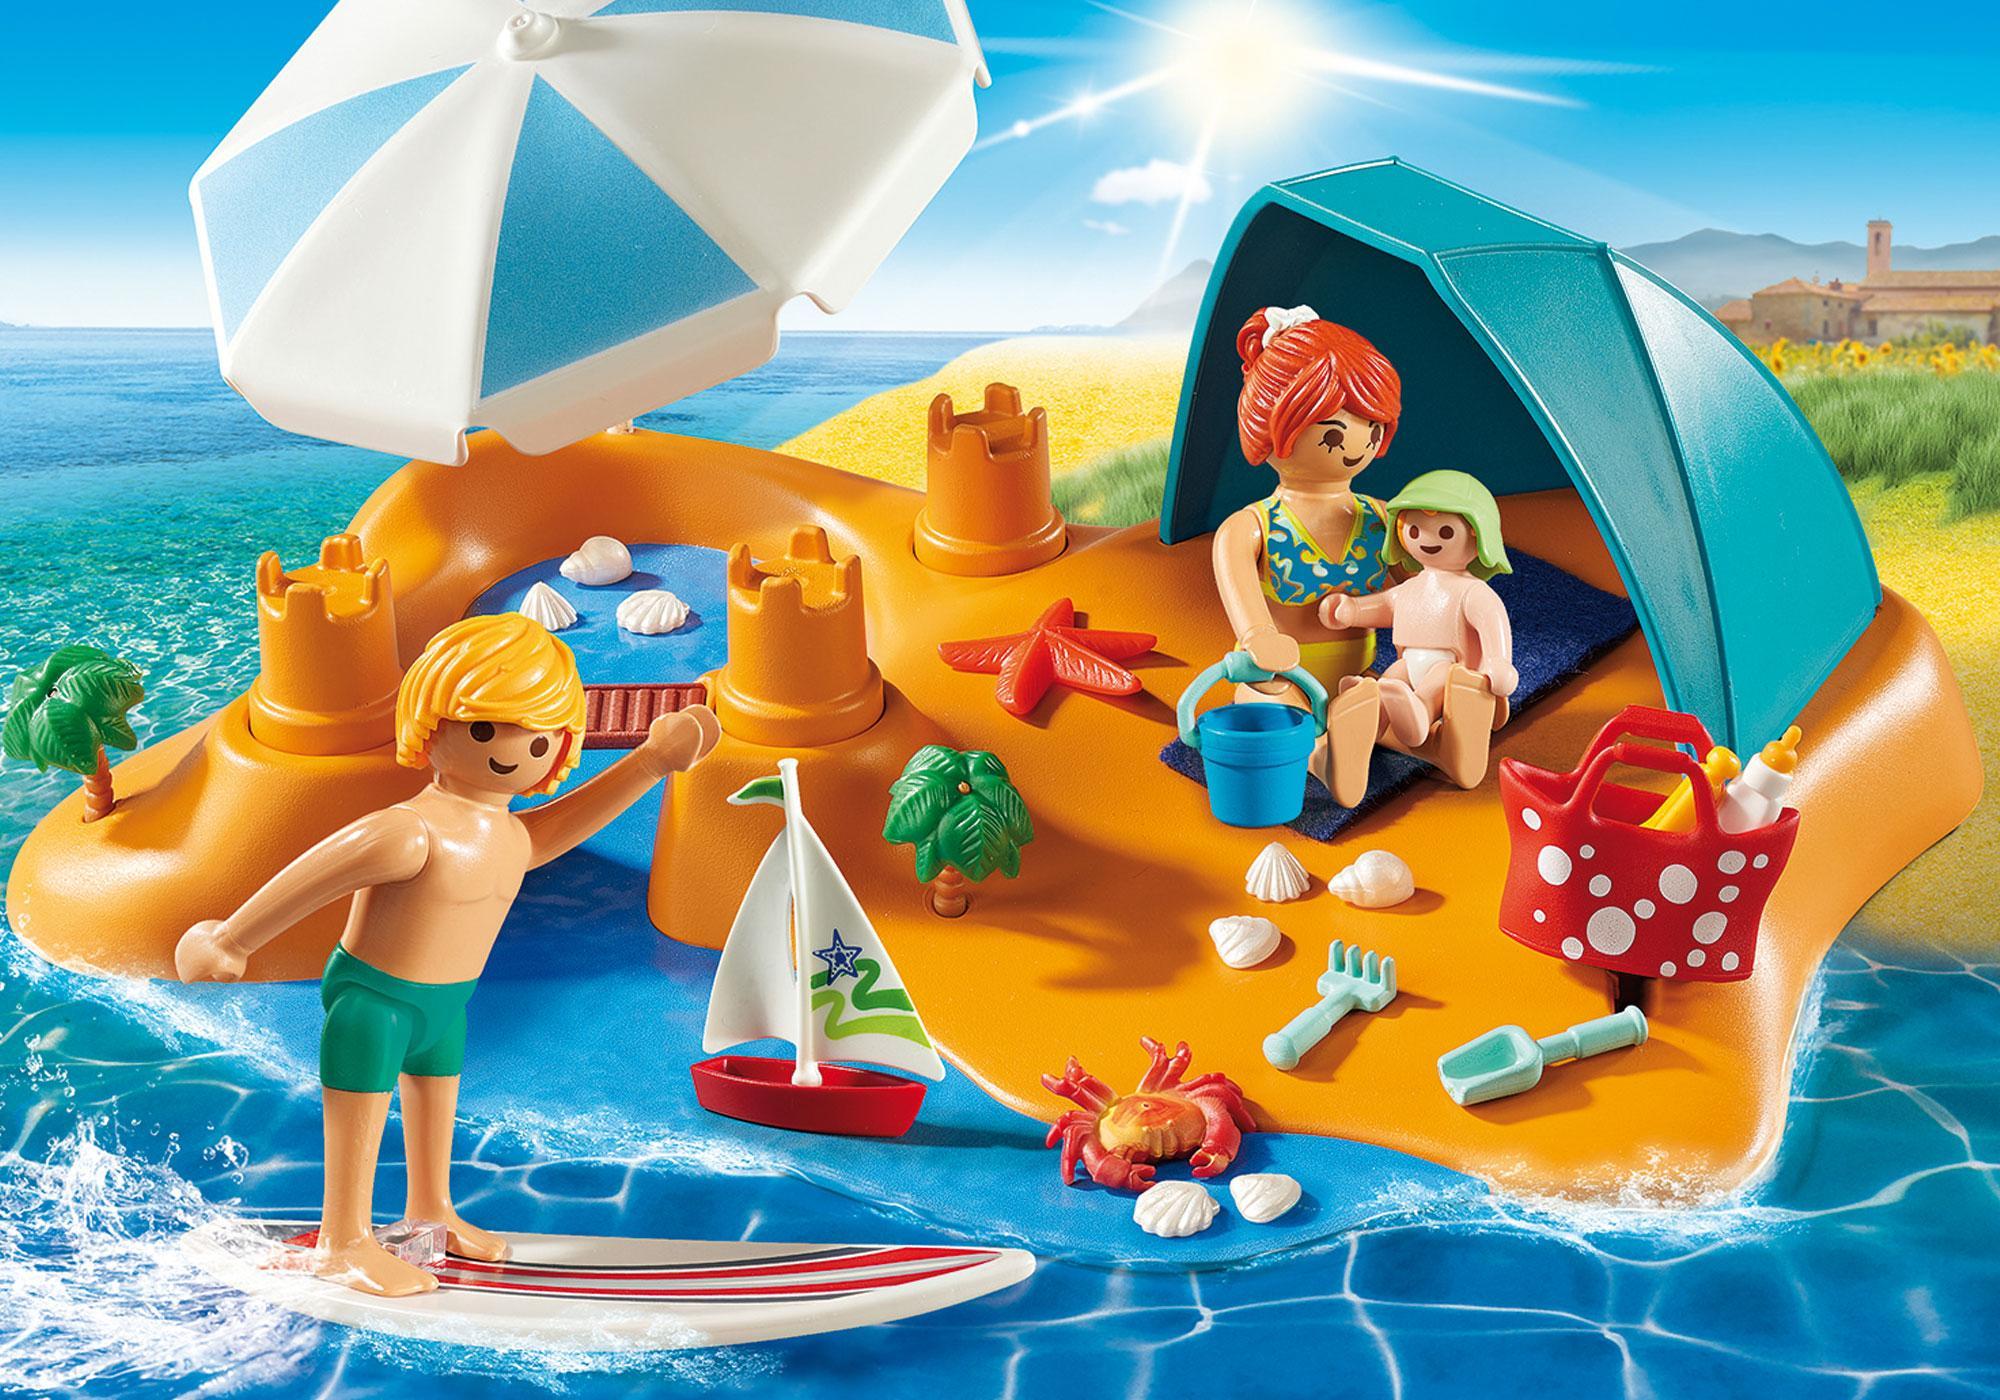 9425_product_detail/Οικογενειακή διασκέδαση στην παραλία